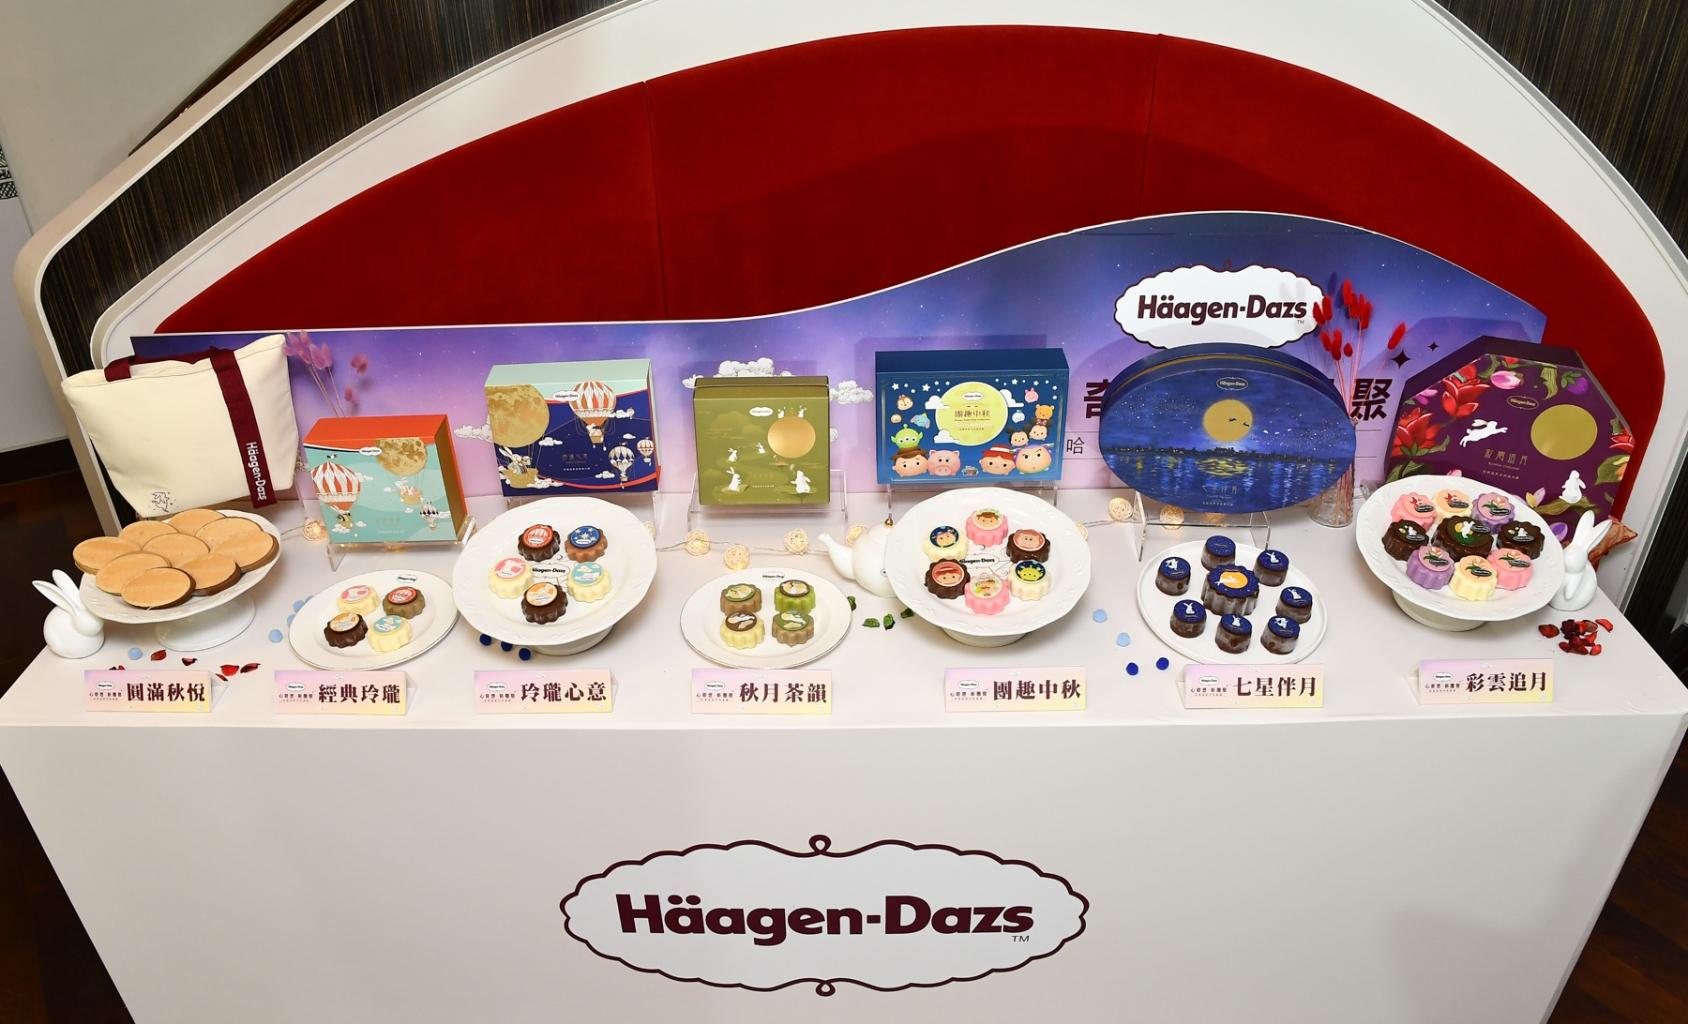 Häagen Dazs延續團聚傳統,同時大膽創新,今年以「心奇想 新團聚」為主題,推出全系列七款冰淇淋禮盒!